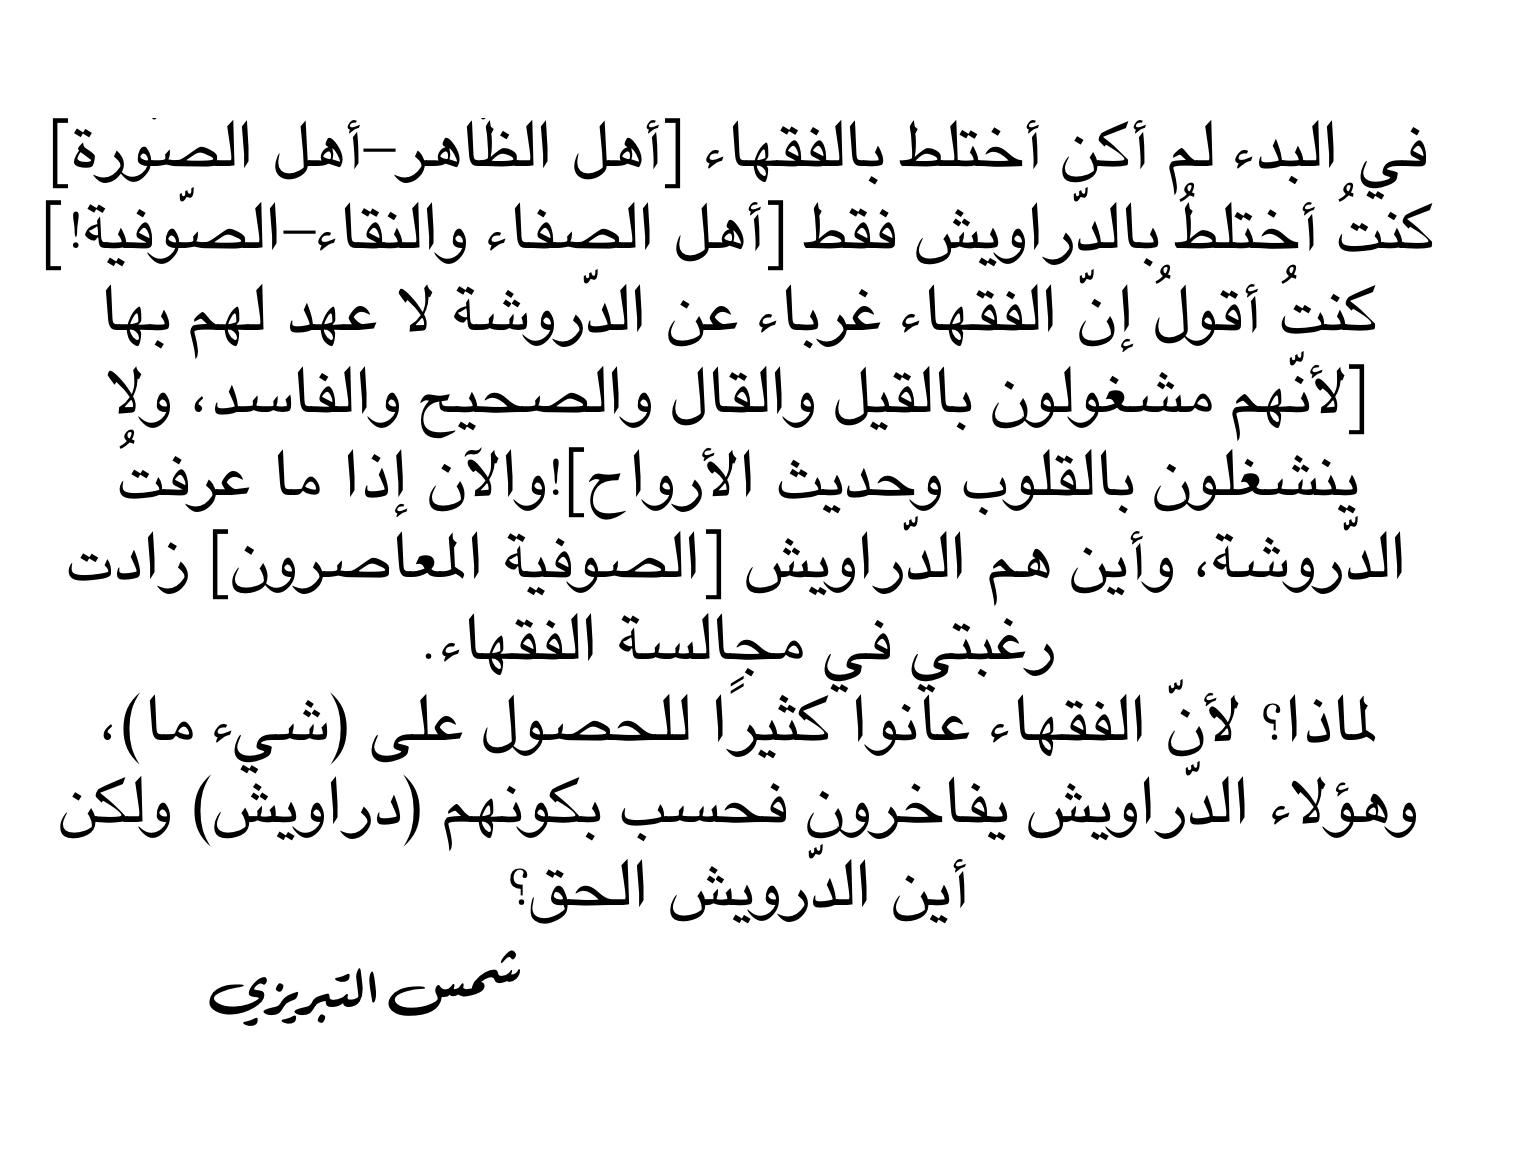 شمس التبريزي Islamic Quotes Quotes Arabic Quotes